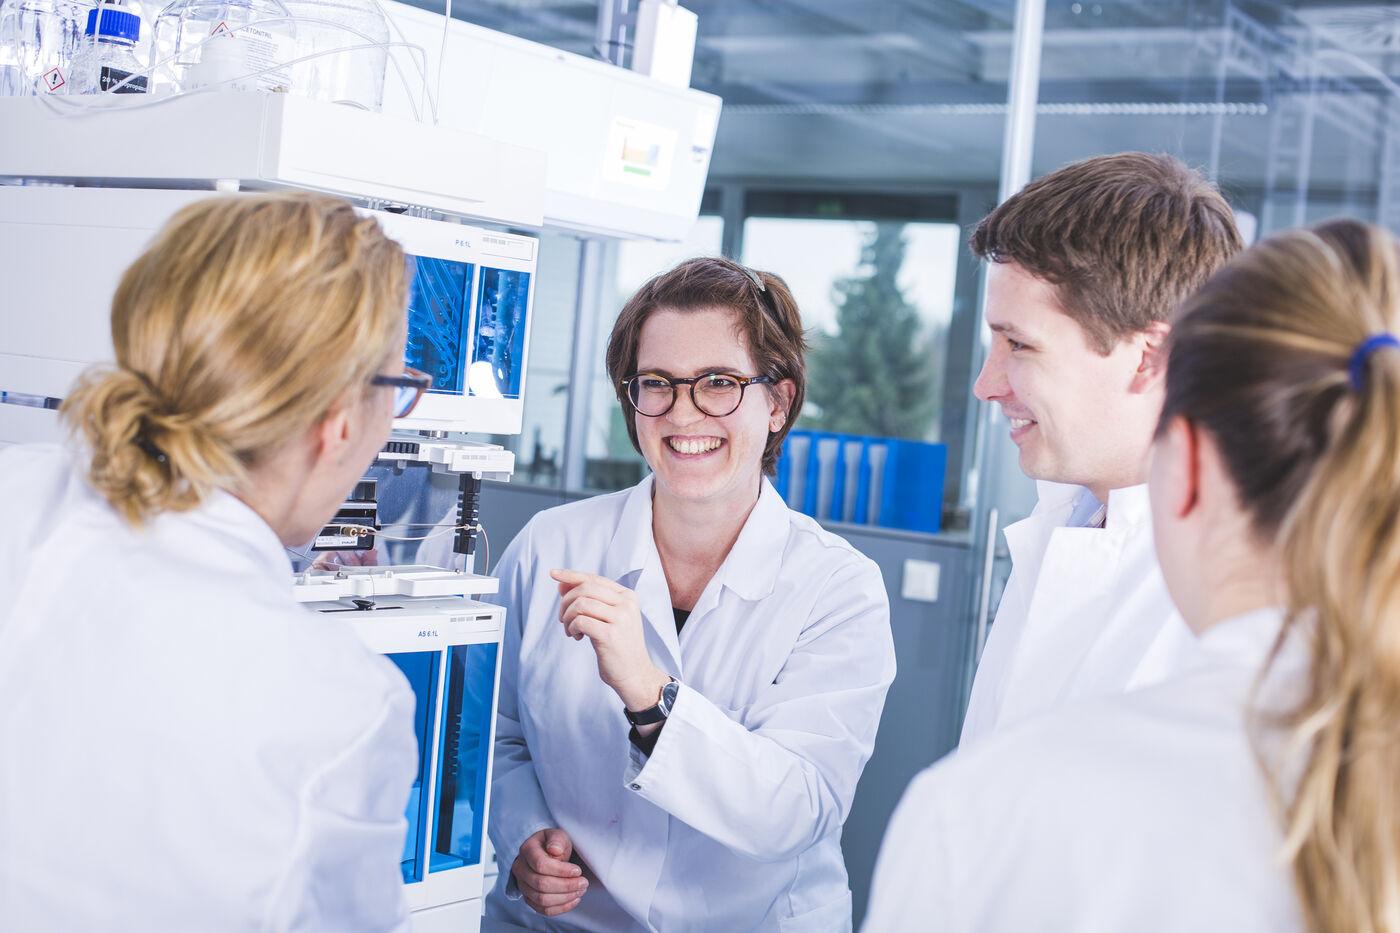 HPLC Experte als Field Sales Manager Süddeutschland (m/w/d) - Job - Jobs at KNAUER